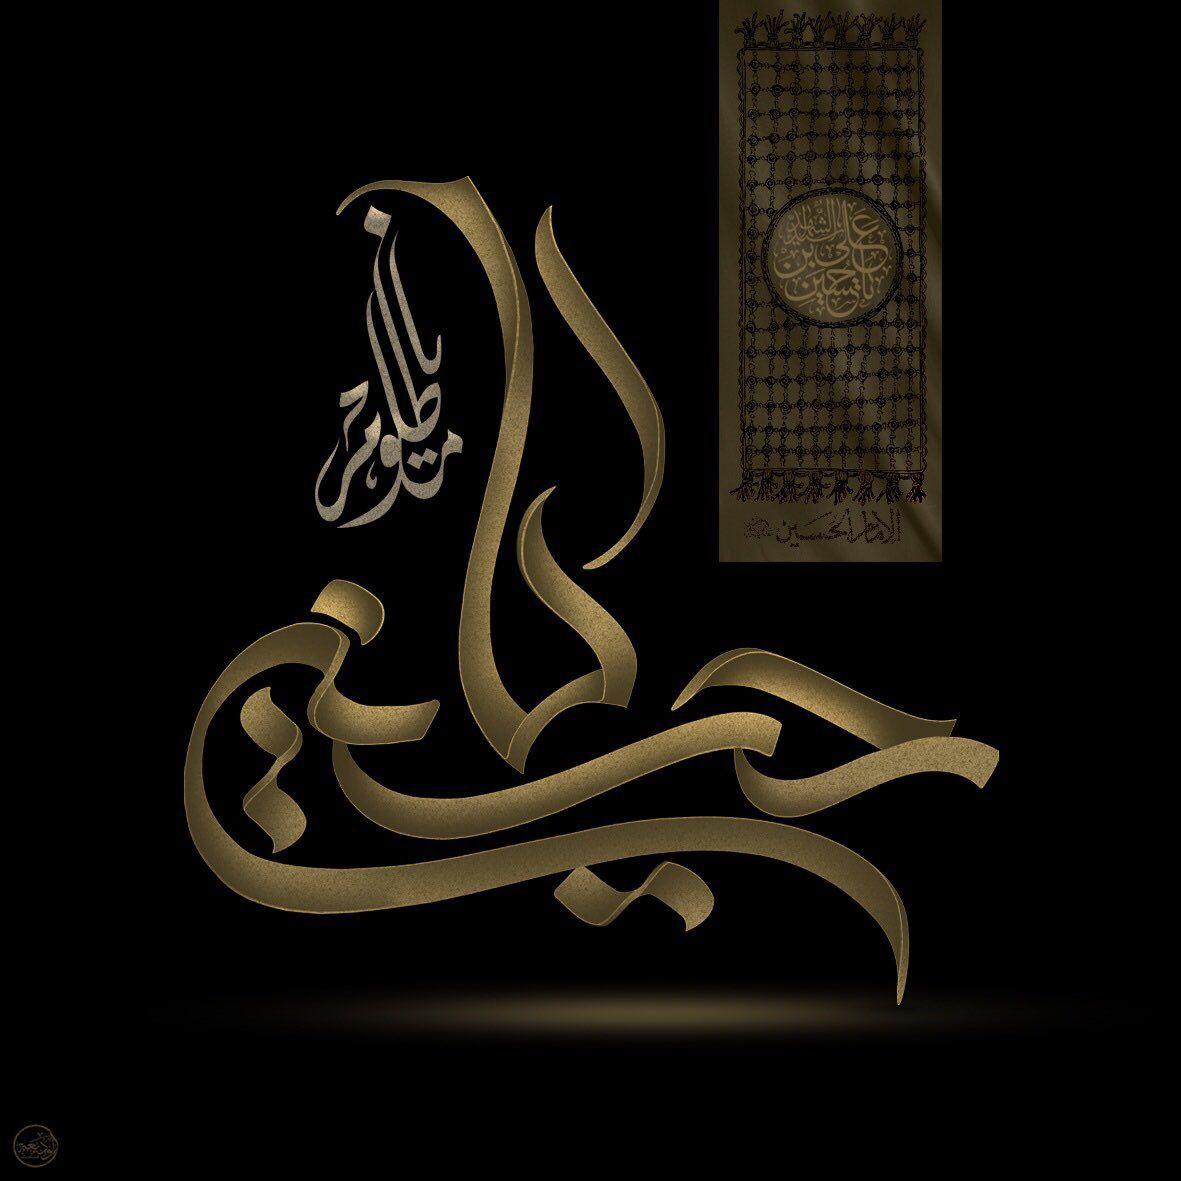 يا مظلوم يا حسين Islamic Art Black Aesthetic Wallpaper Karbala Photography